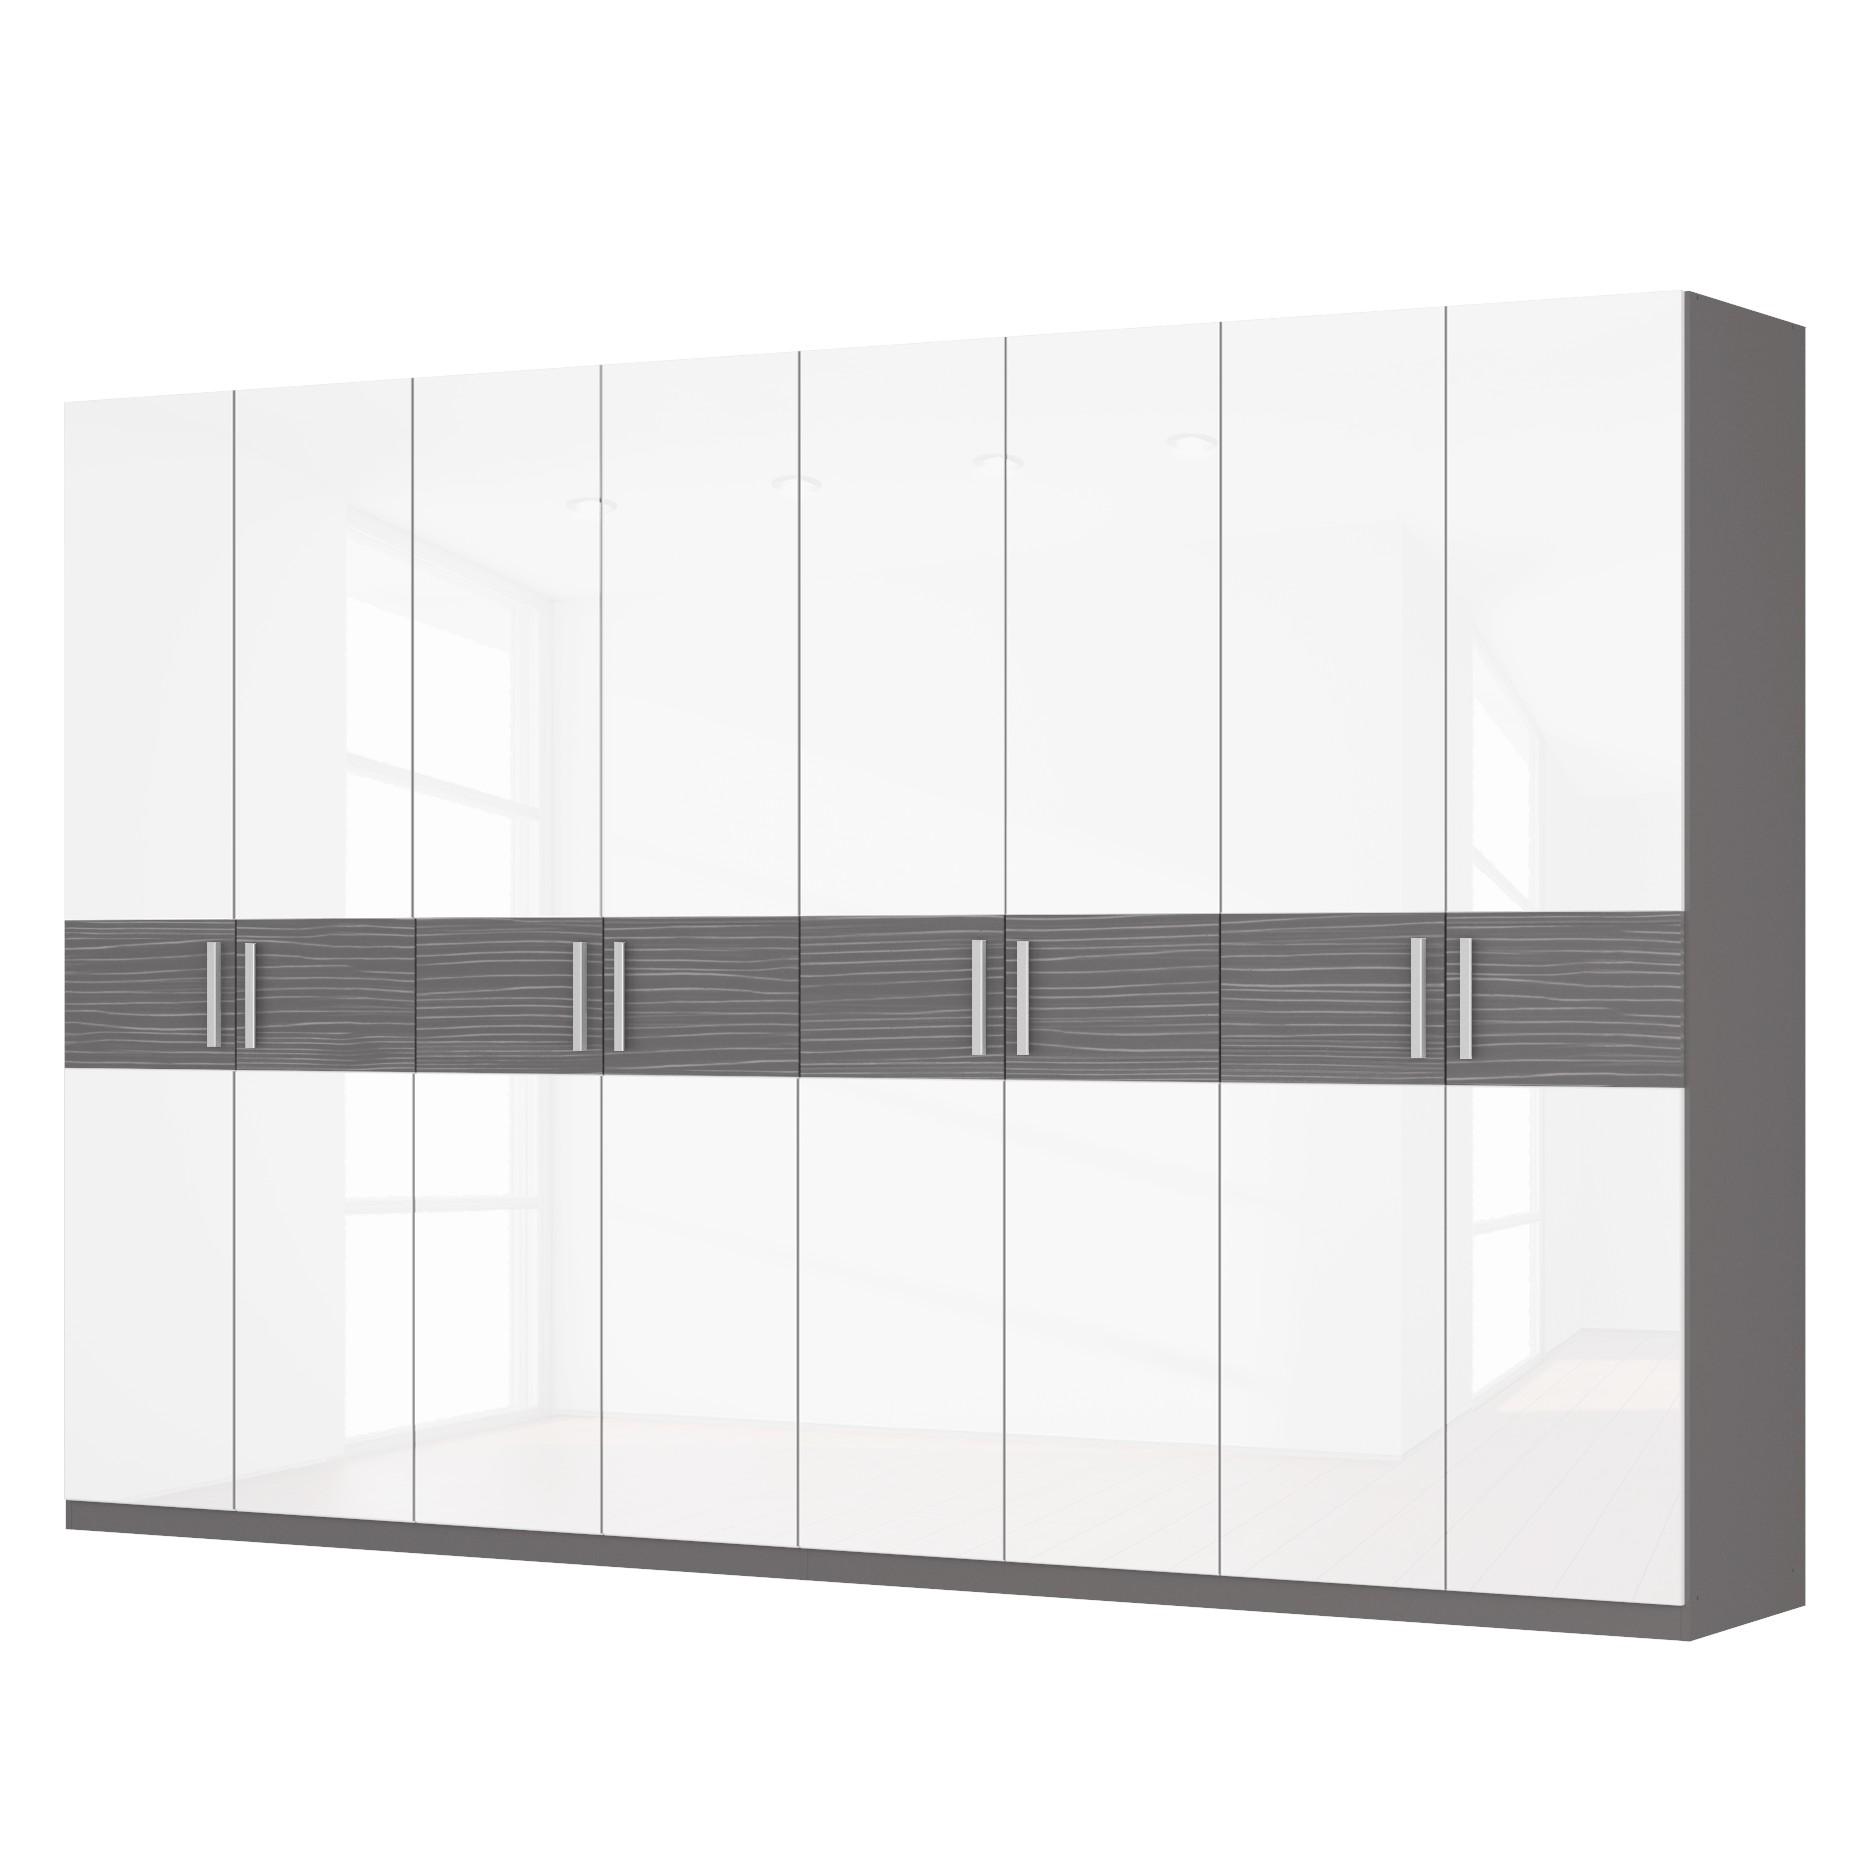 Drehtürenschrank SKØP III – Hochglanz Weiß/ Strukturholz Graphit – 360 cm (8-türig) – 236 cm – Premium, SKØP günstig